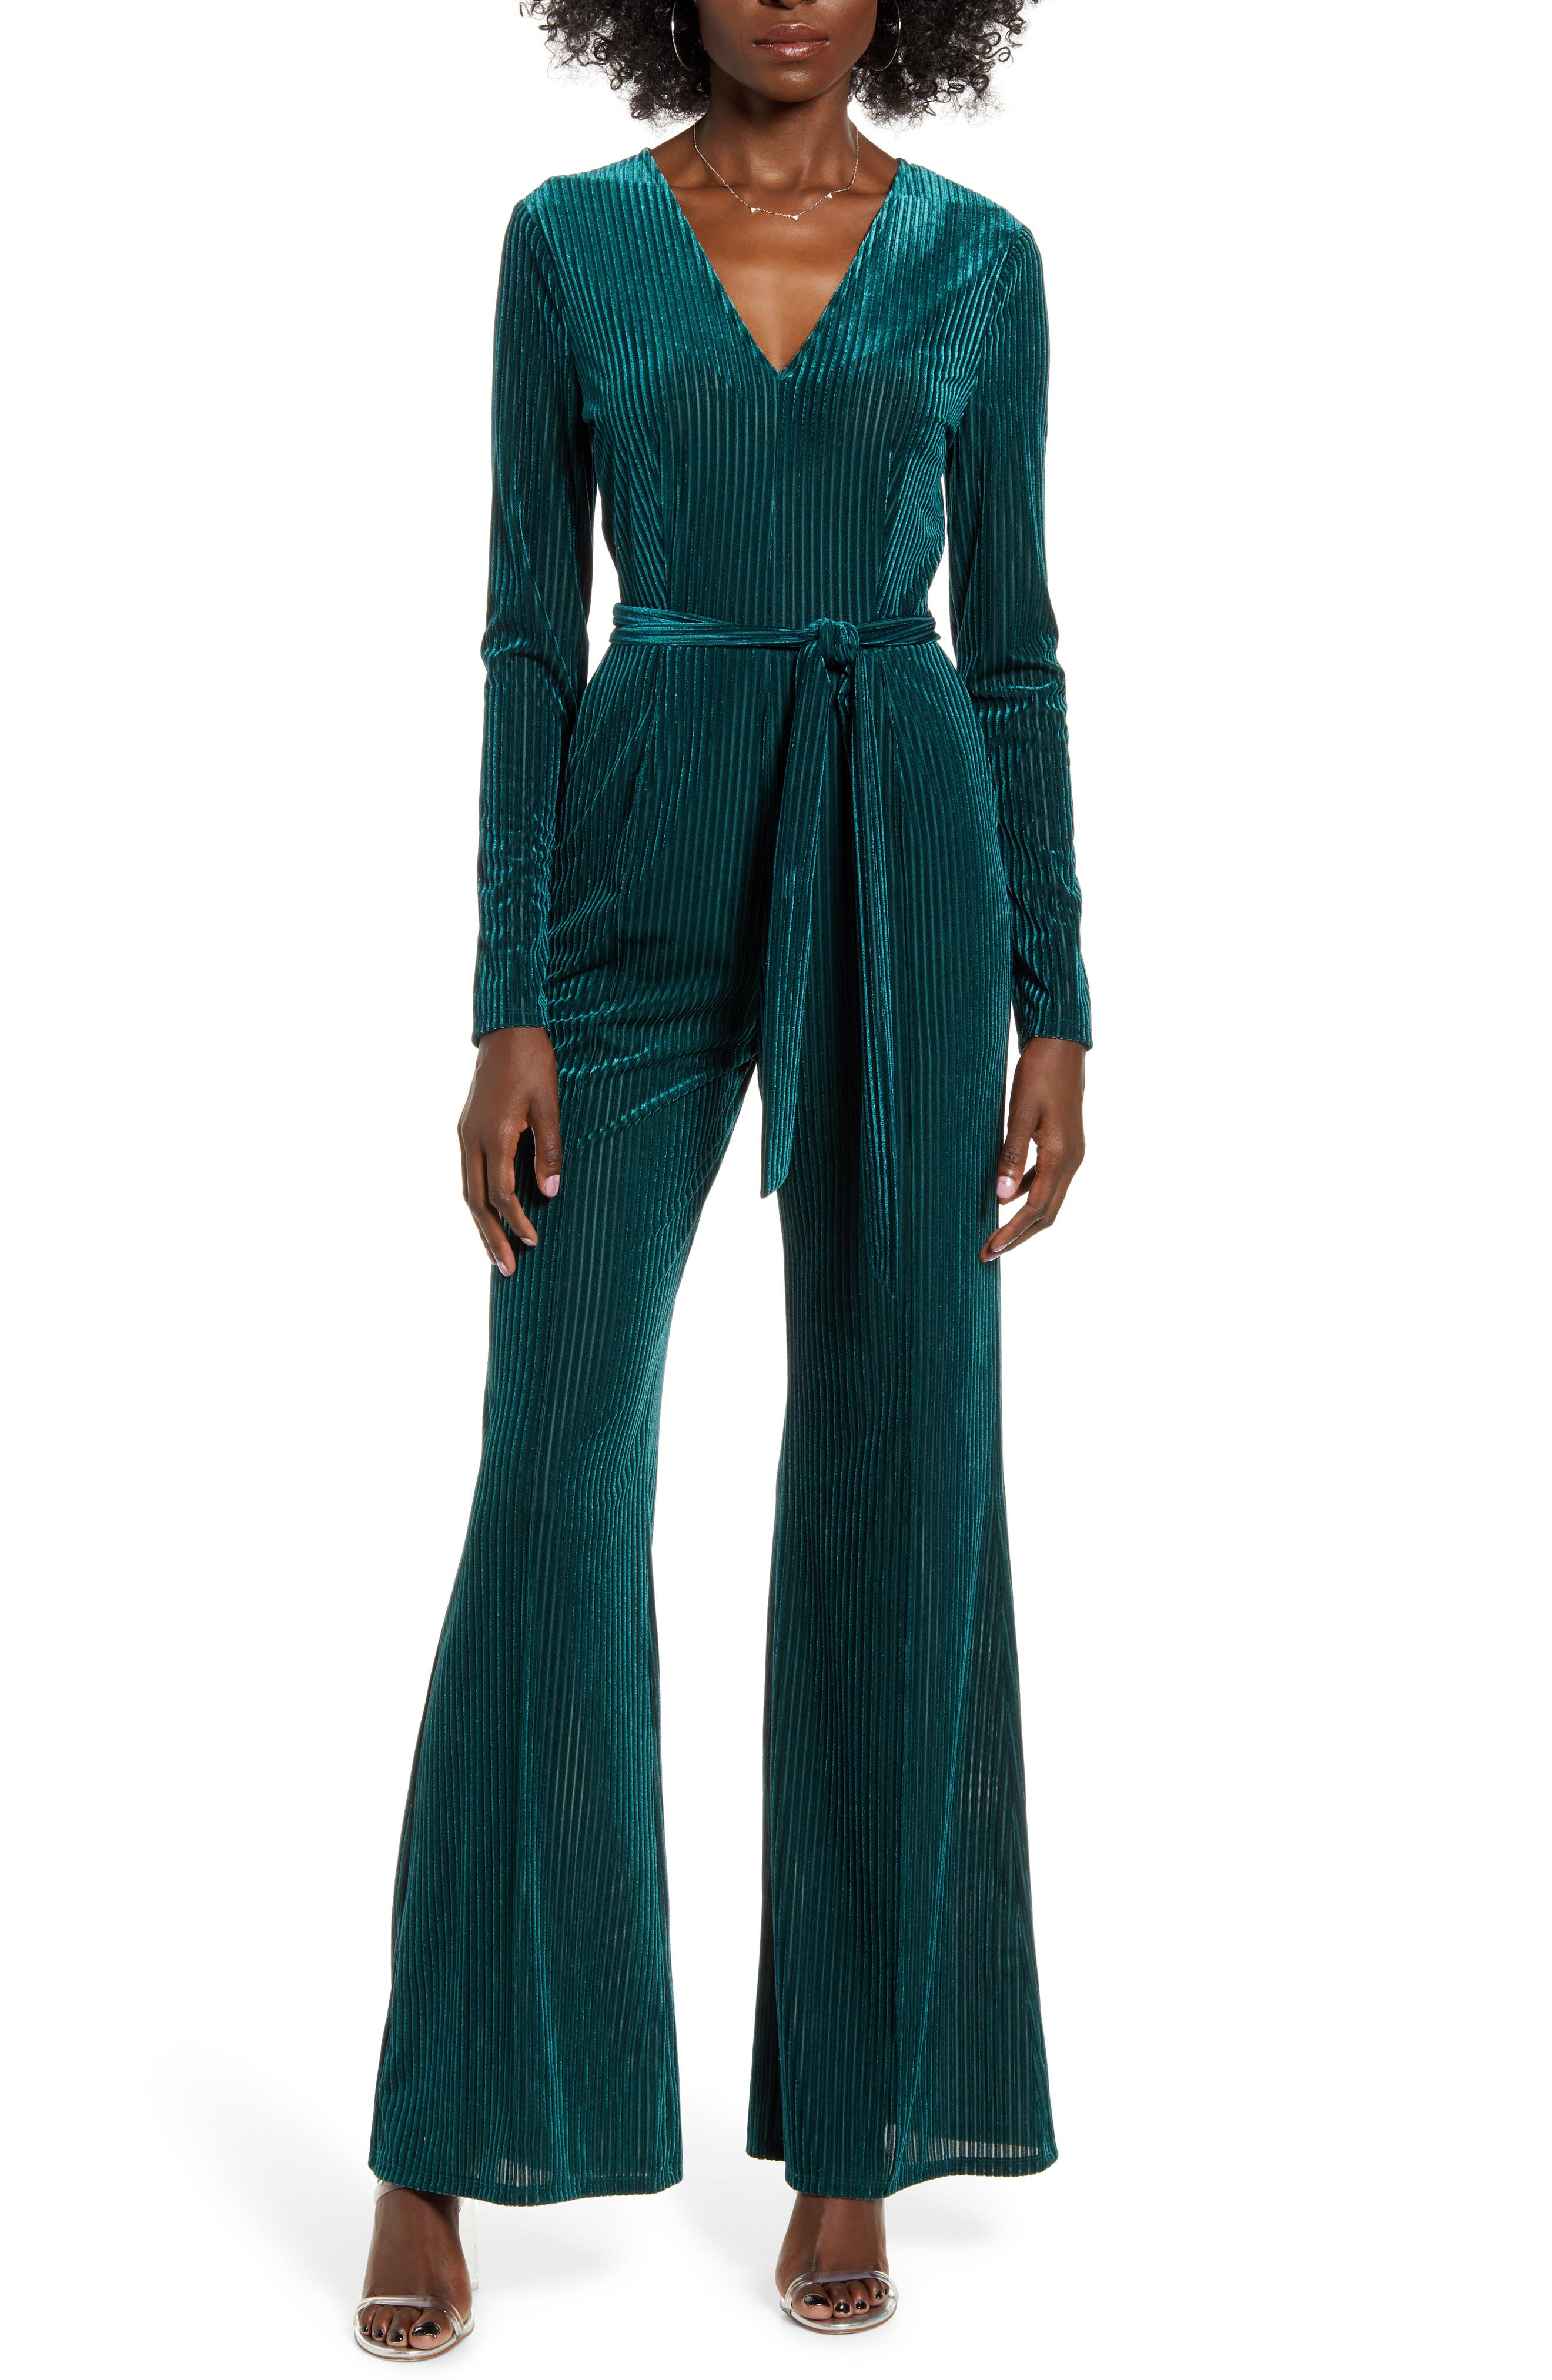 70s Jumpsuit   Disco Jumpsuits – Sequin, Striped, Gold, White, Black Womens Astr The Label Velvet Jumpsuit $53.40 AT vintagedancer.com